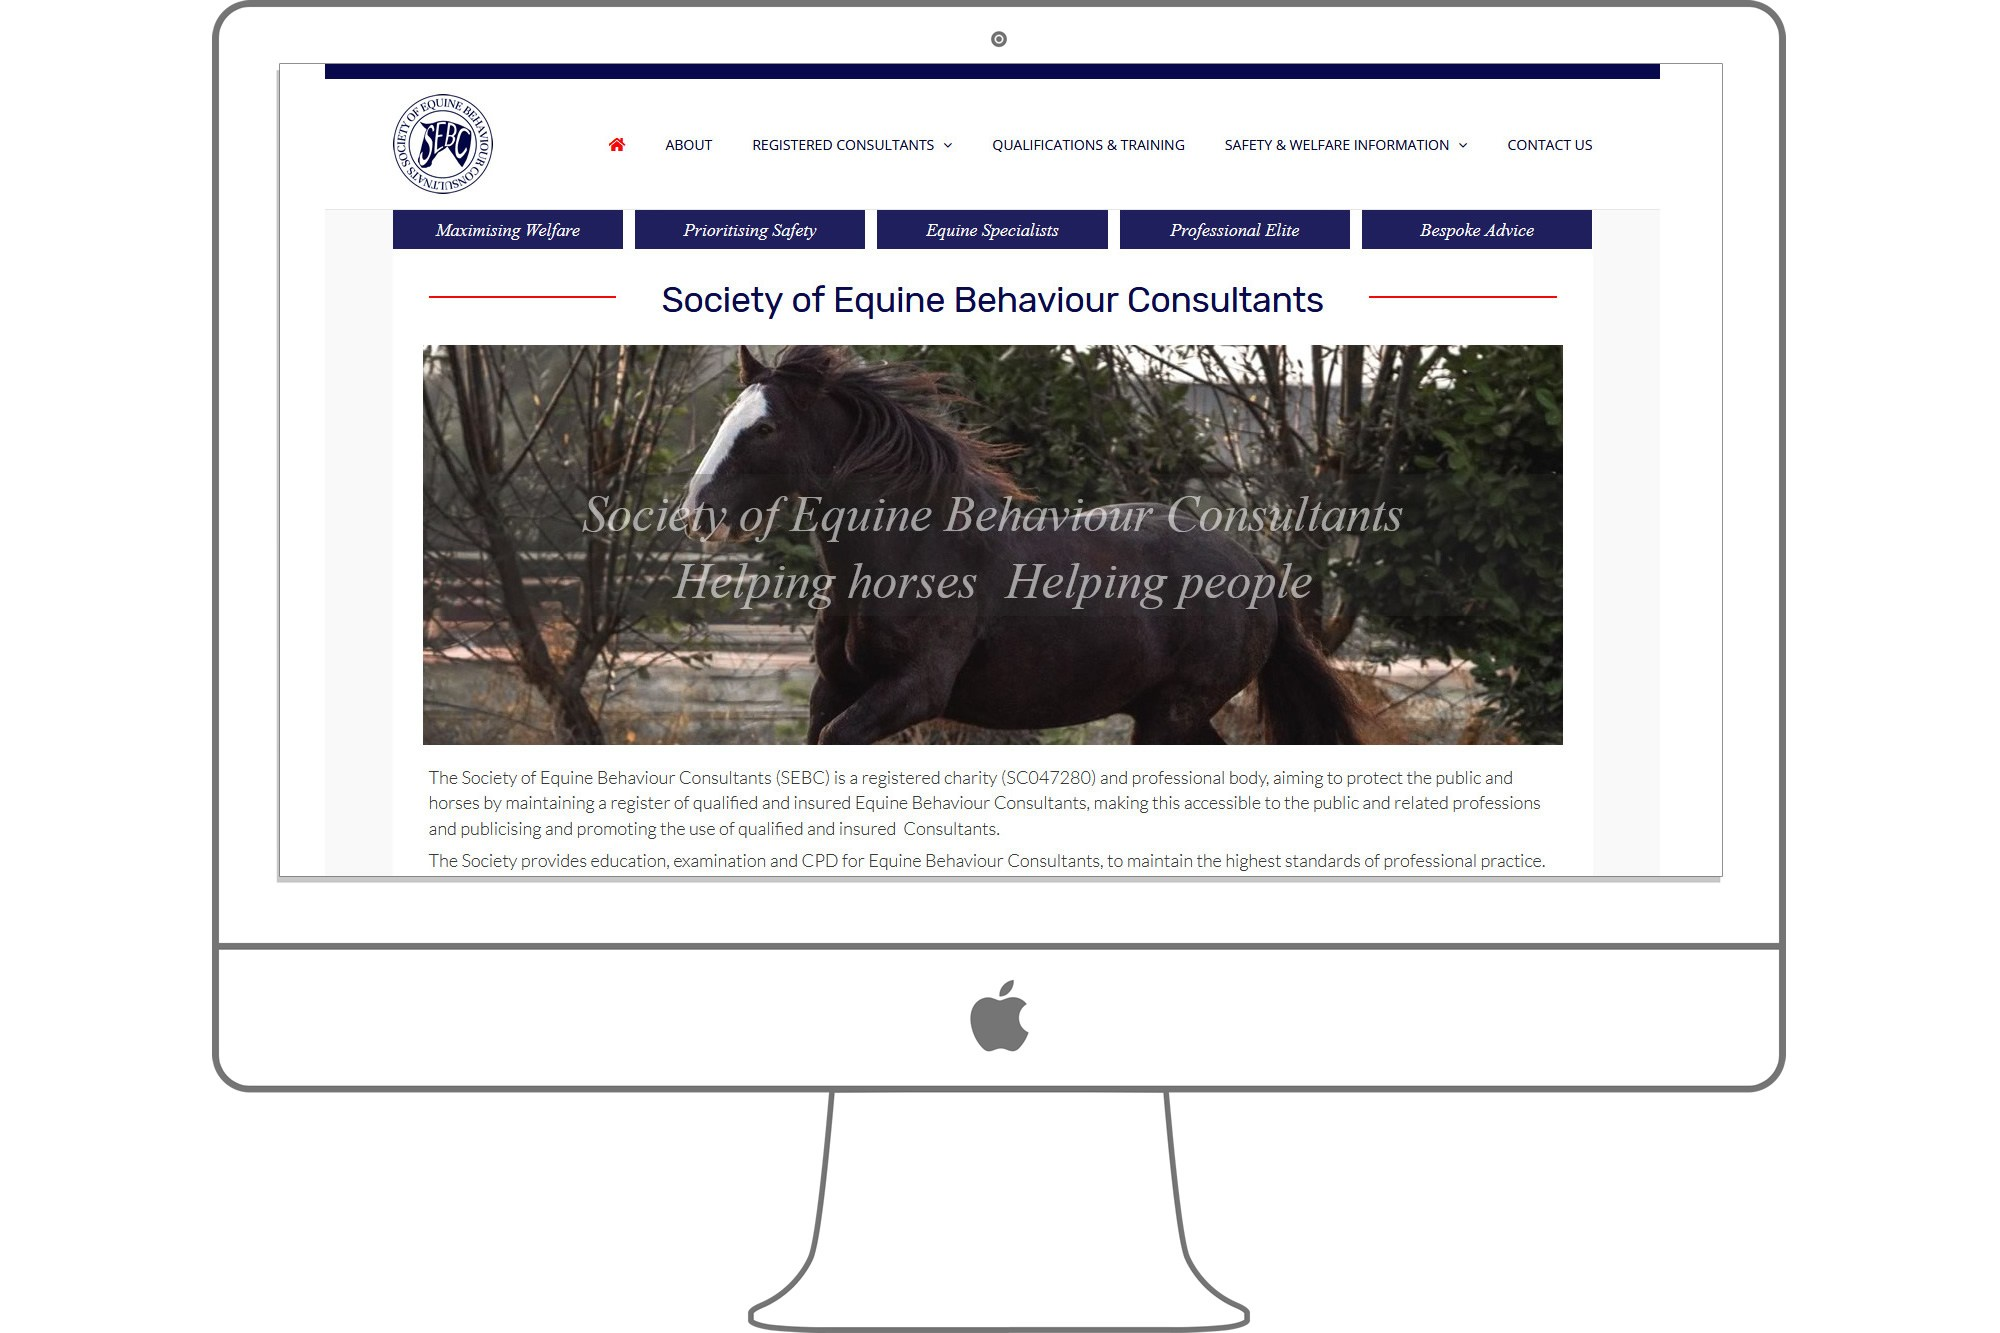 Society of Equine Behaviour Consultants